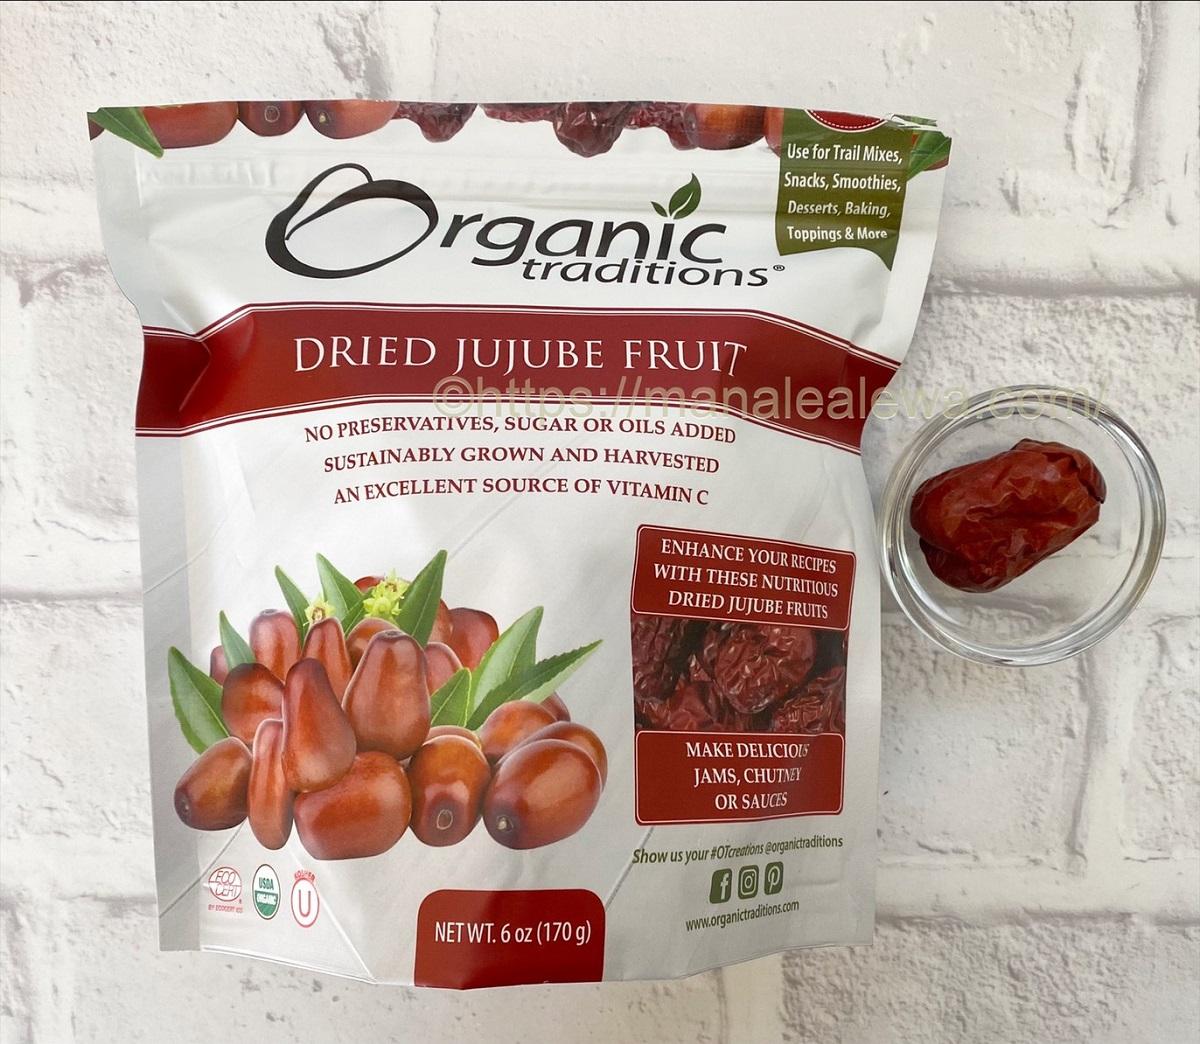 Organic-Traditions-dried-jujube